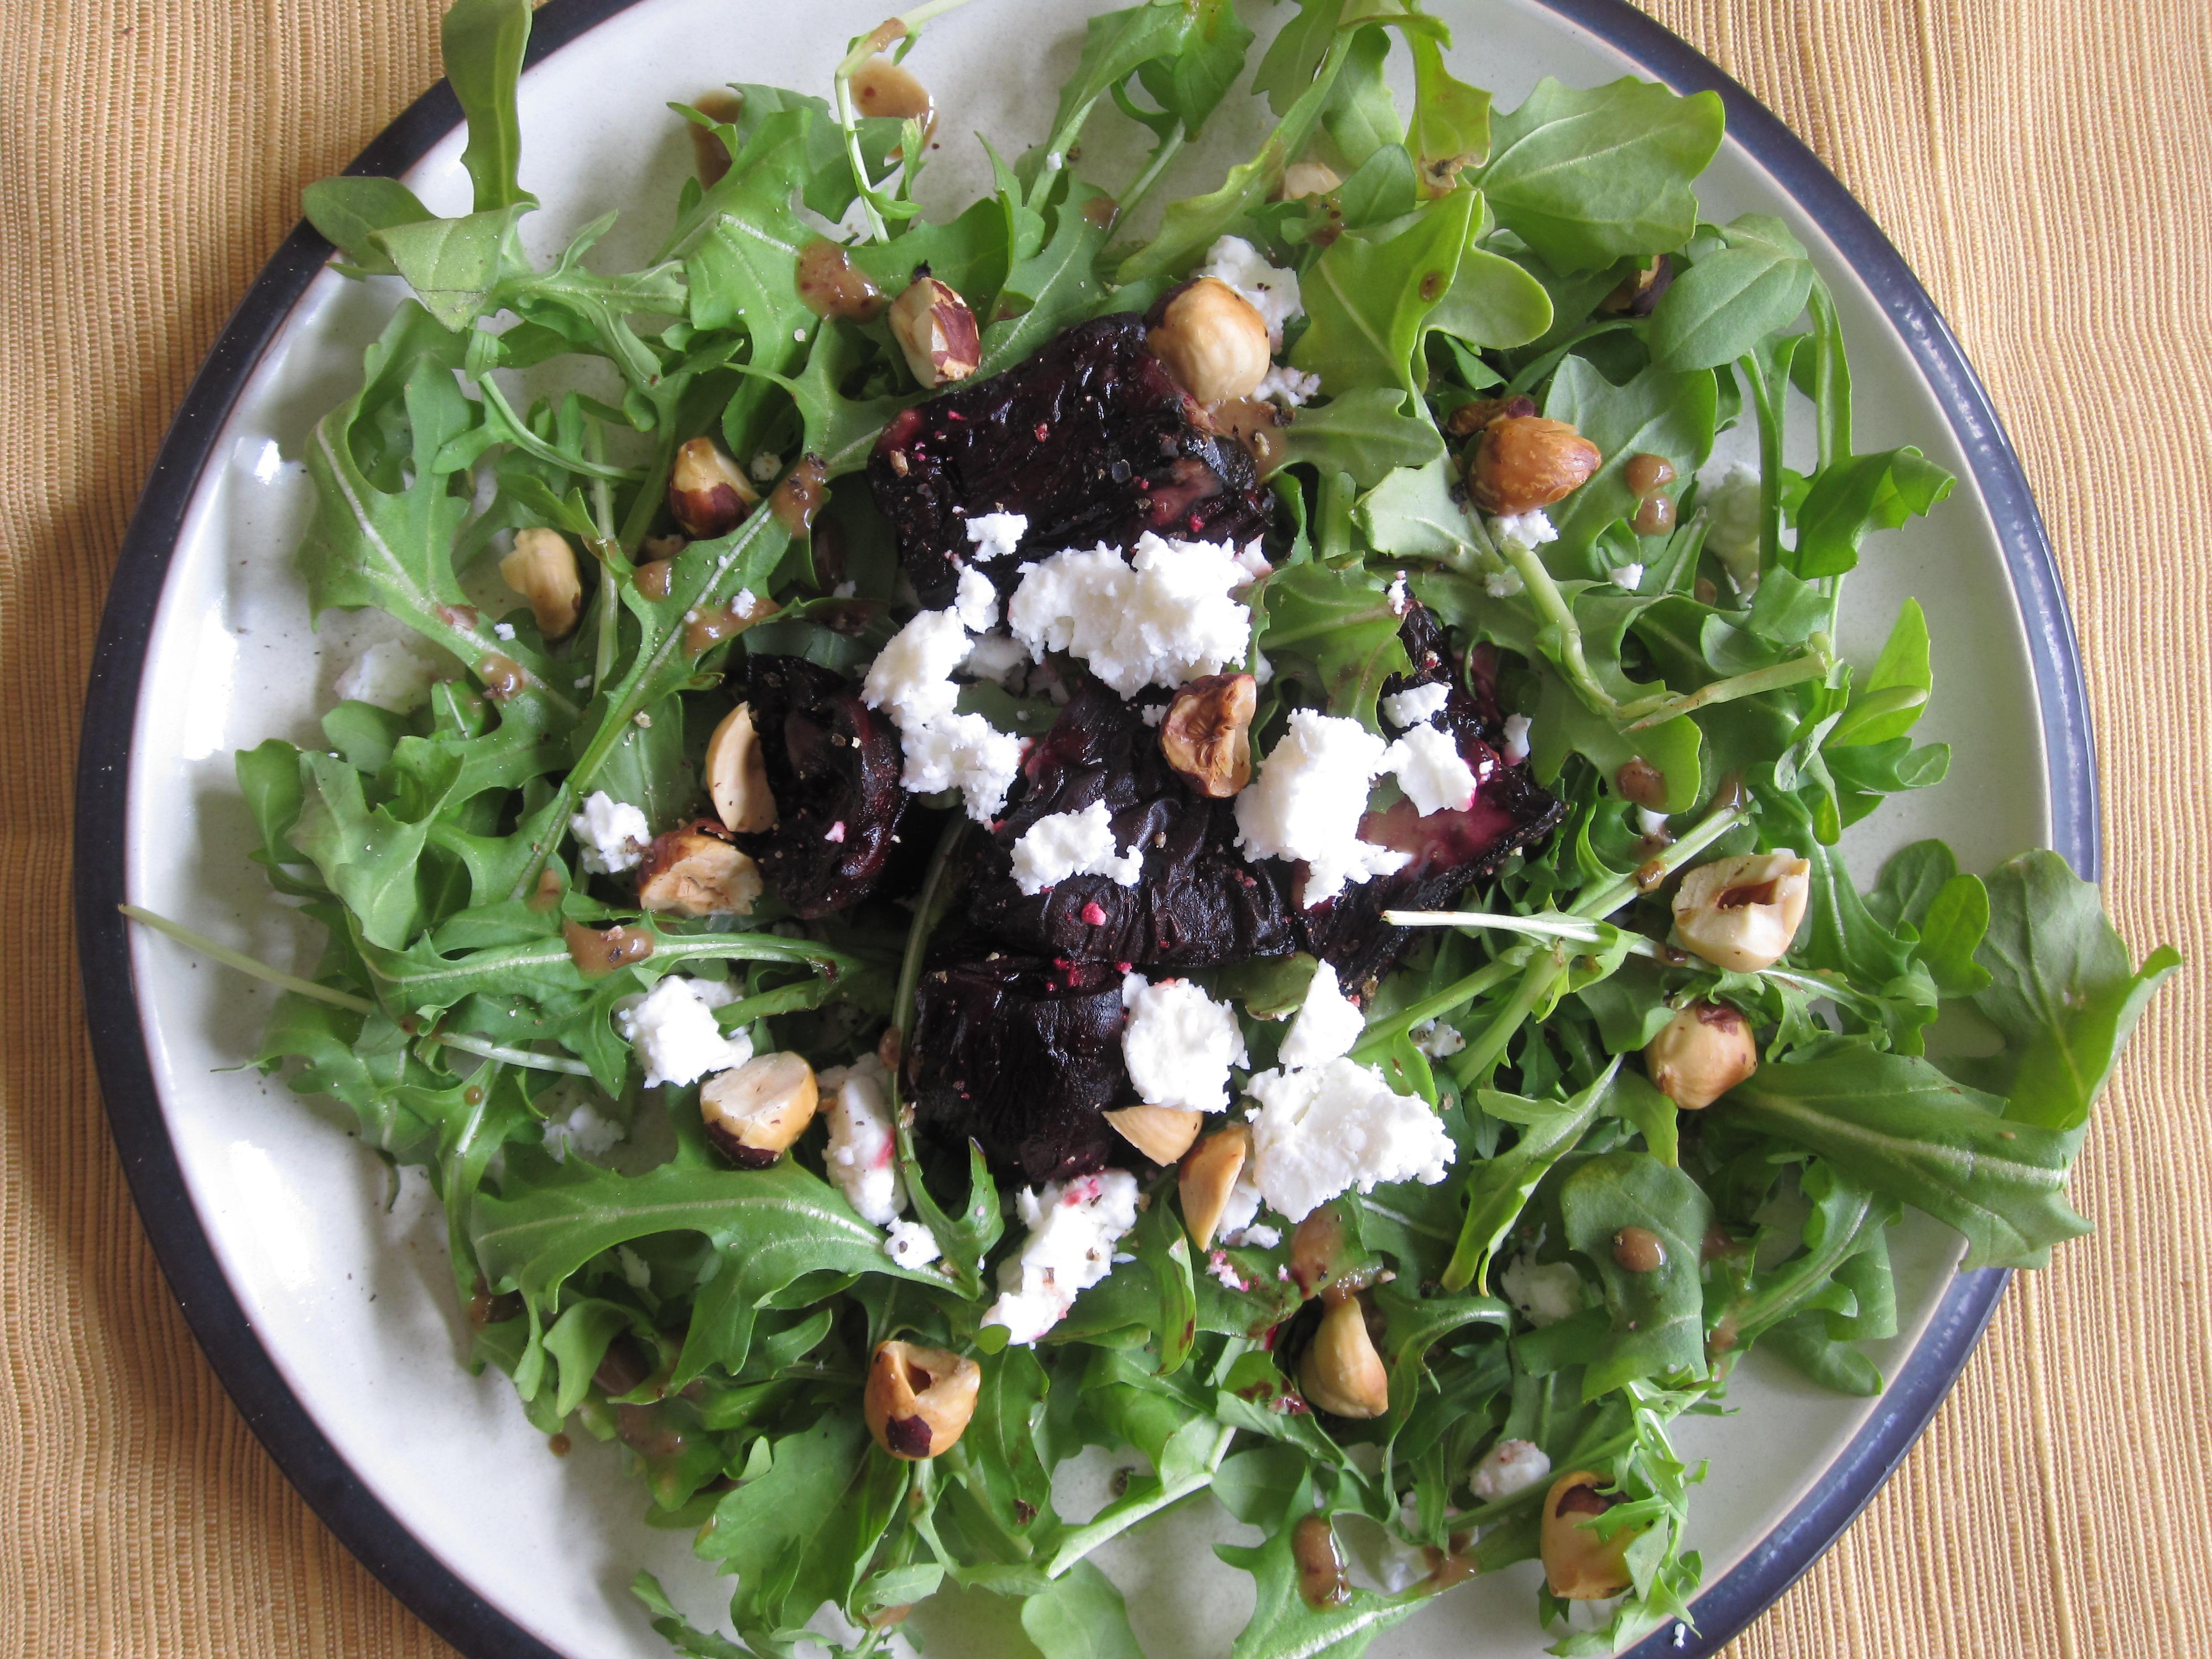 Roasted Beet and Hazelnut Salad with Feta | My Pantry Shelf